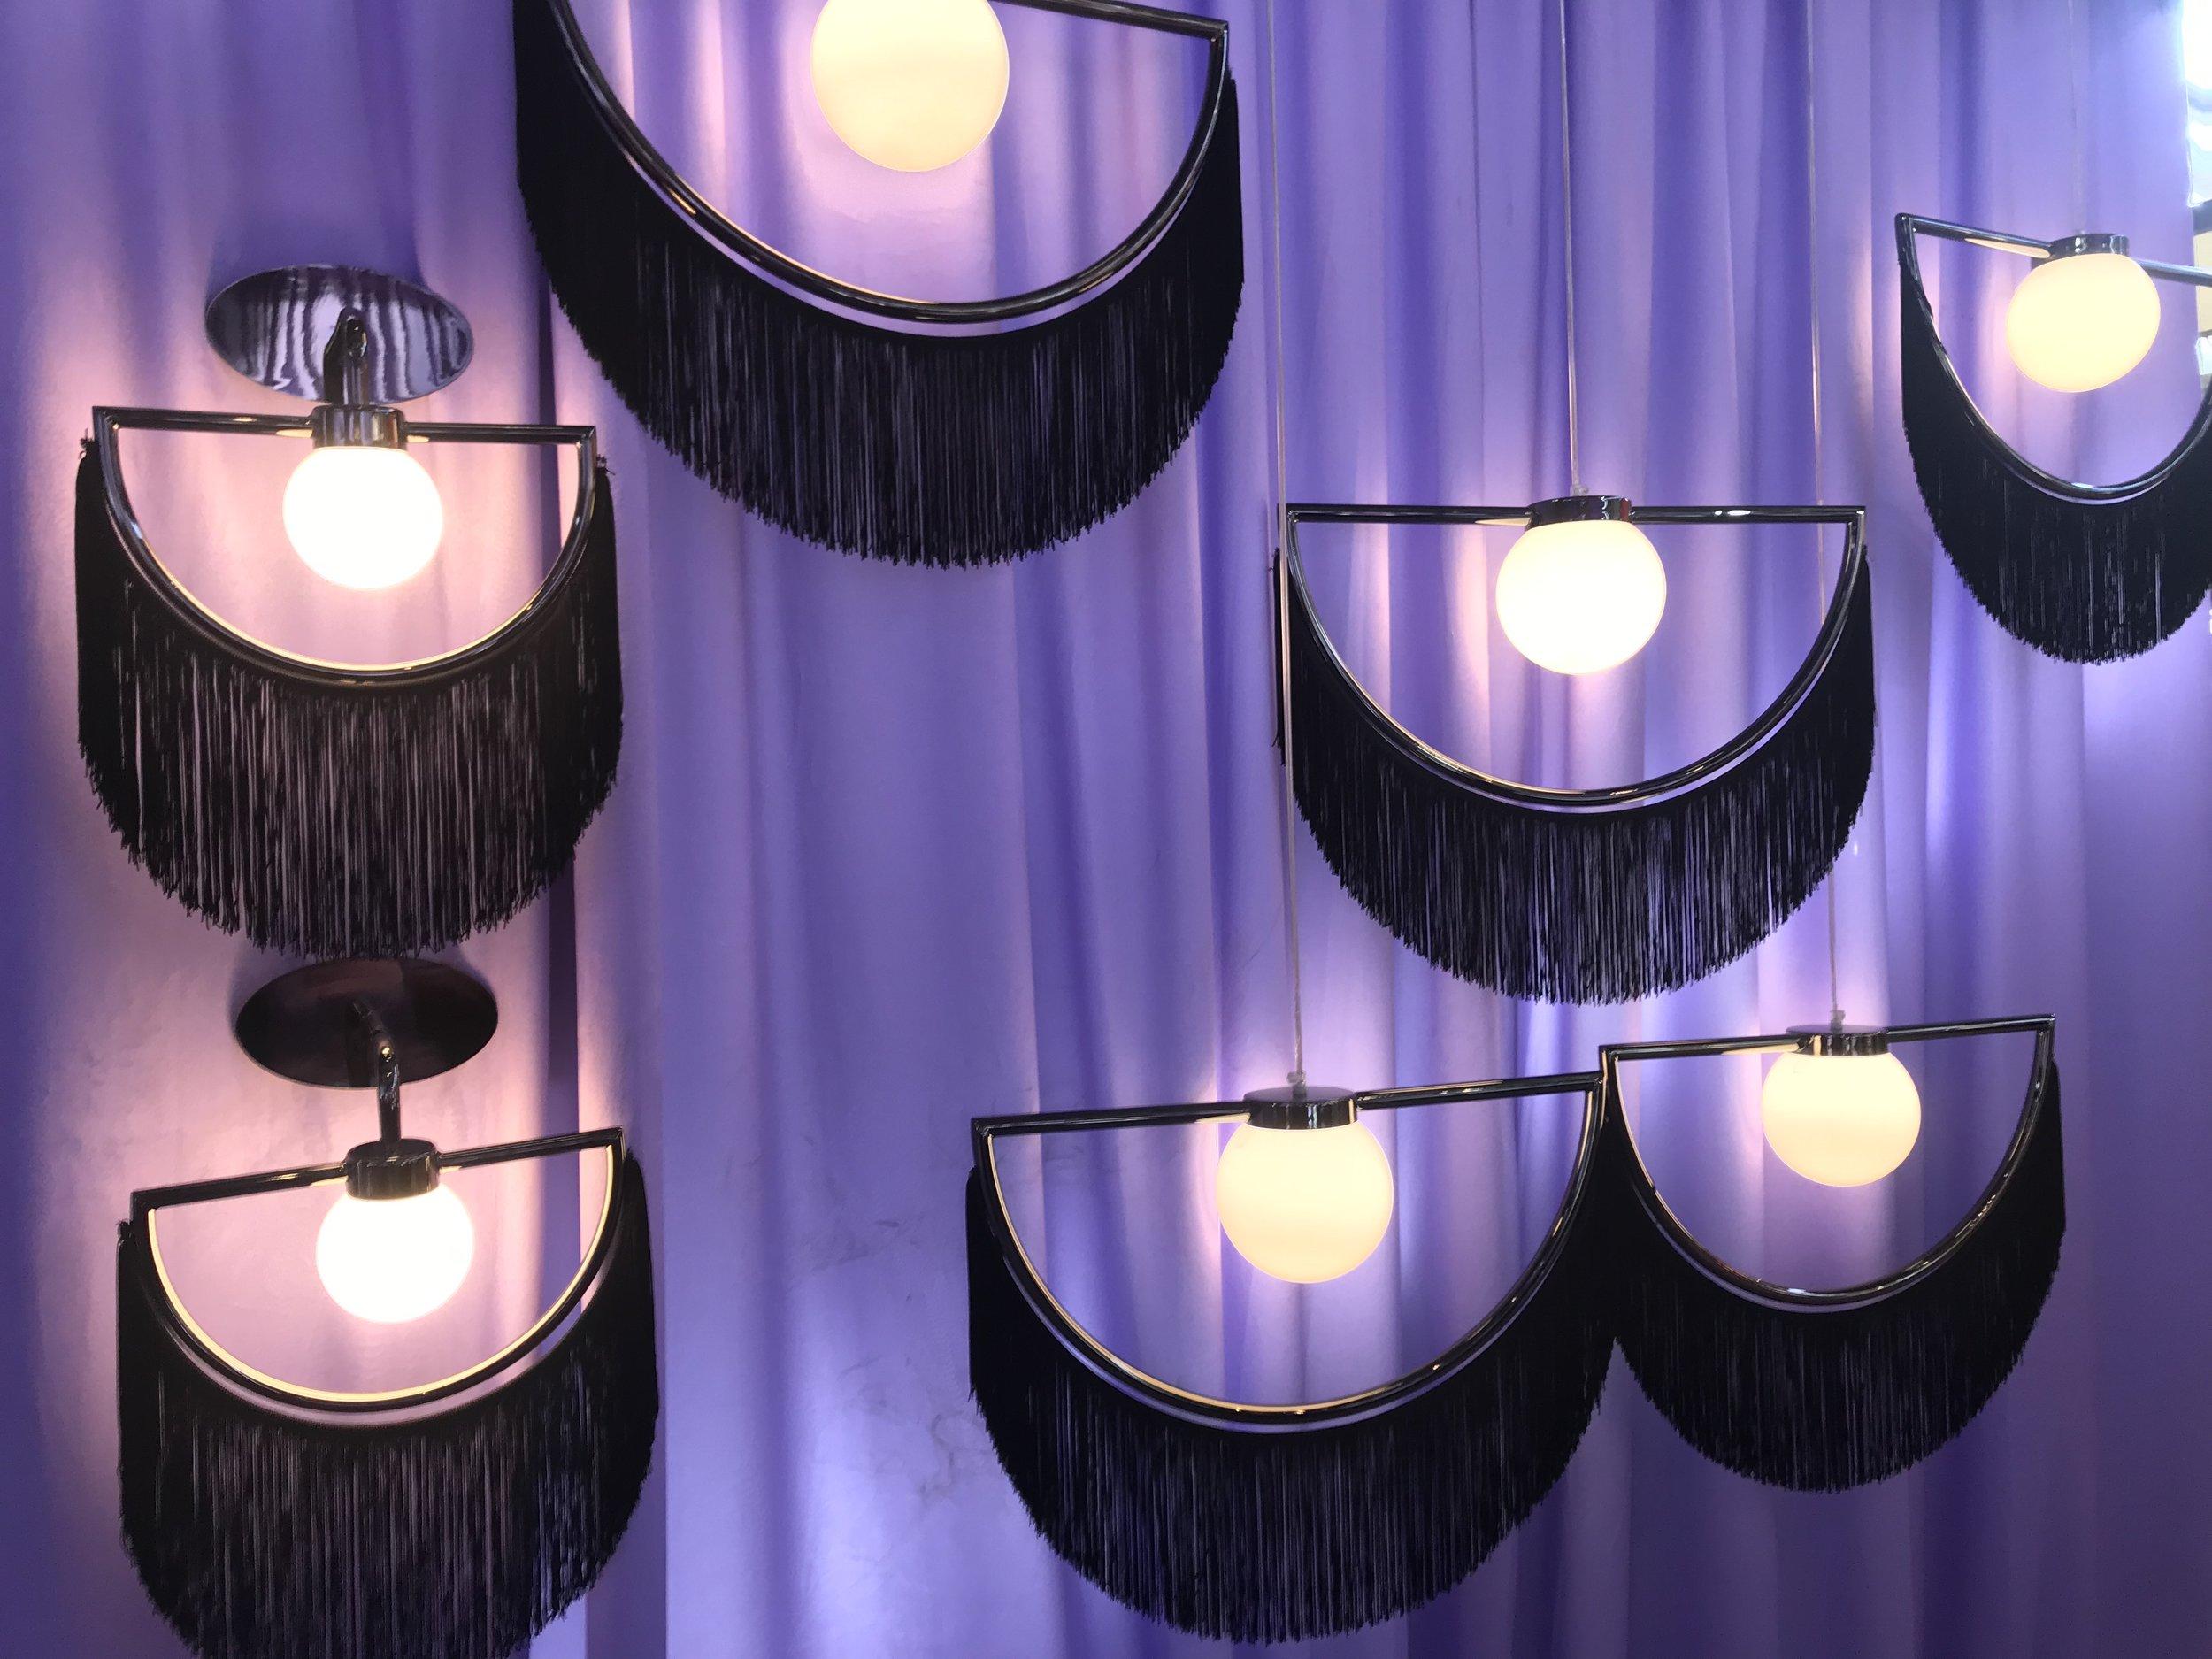 Houtique booth, Maison & Objet january 2019